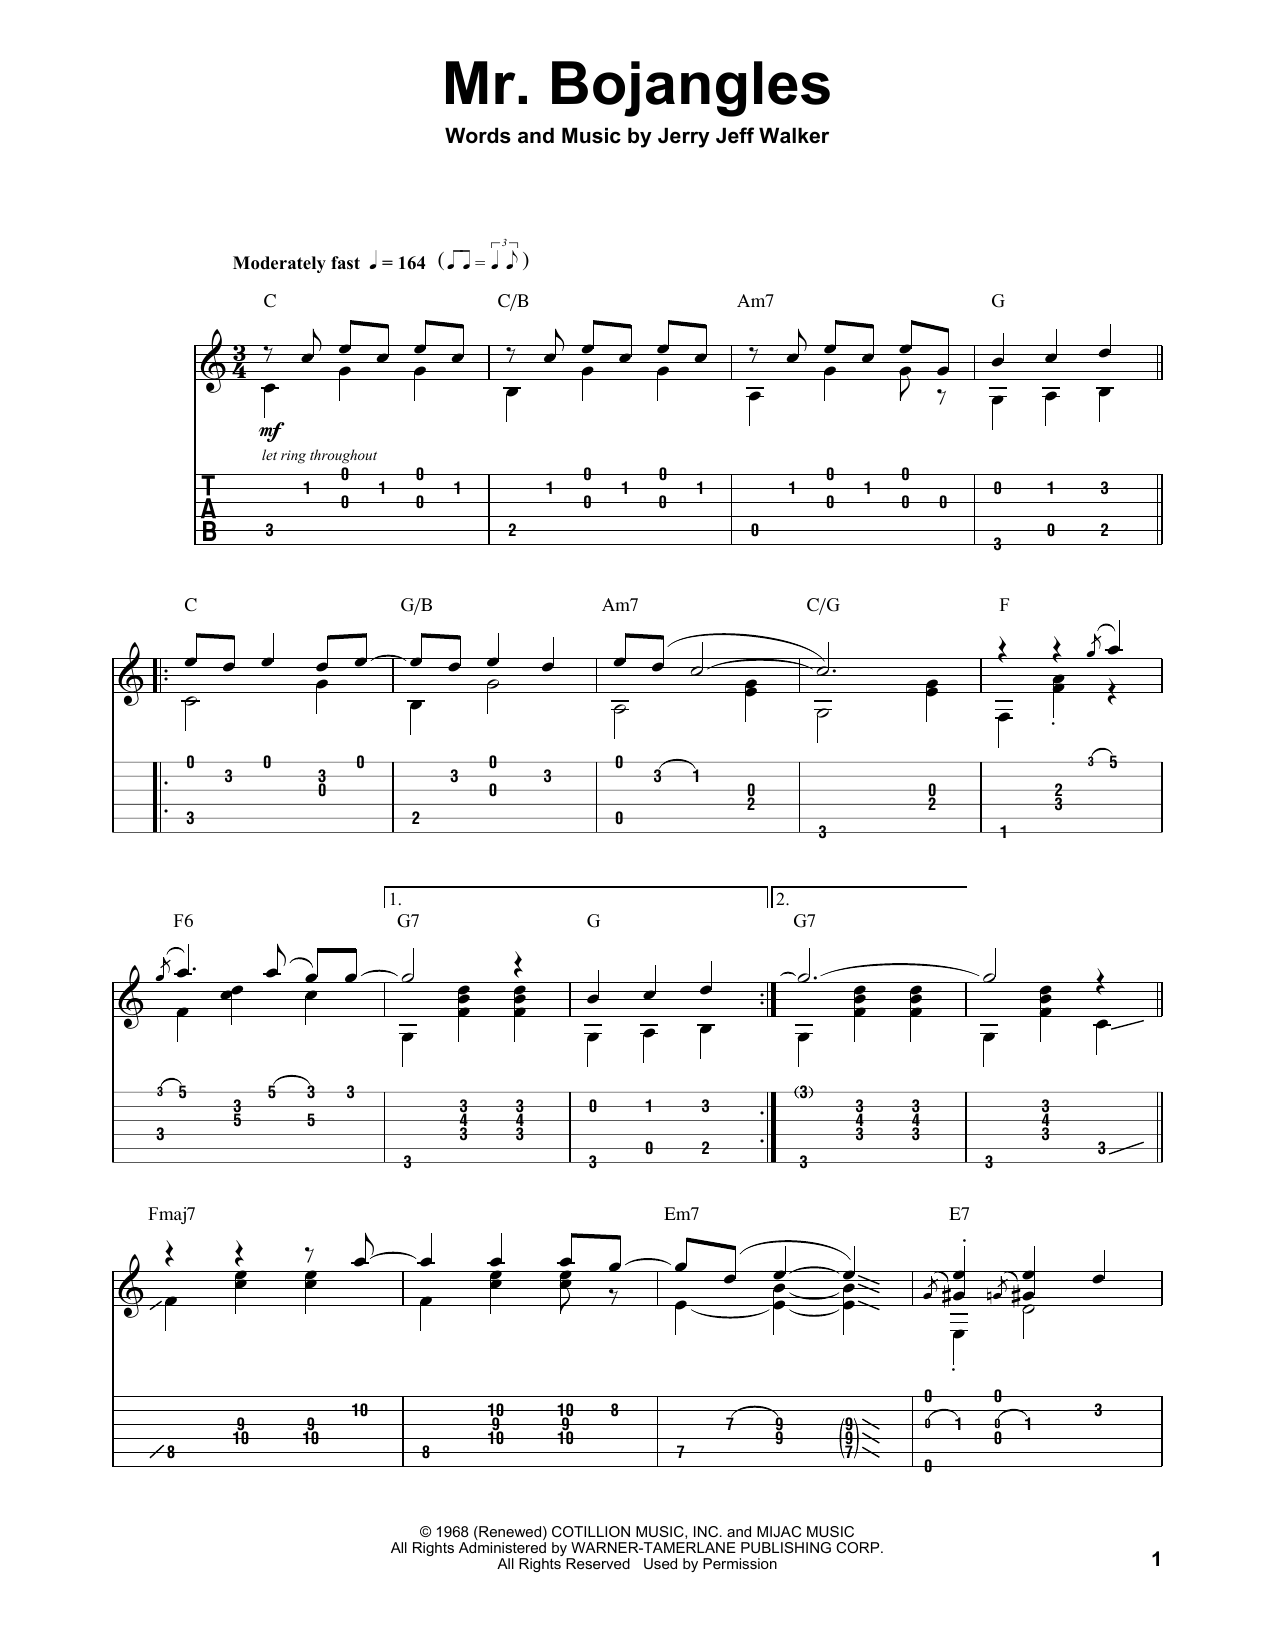 Chet Atkins Mr. Bojangles sheet music notes and chords. Download Printable PDF.